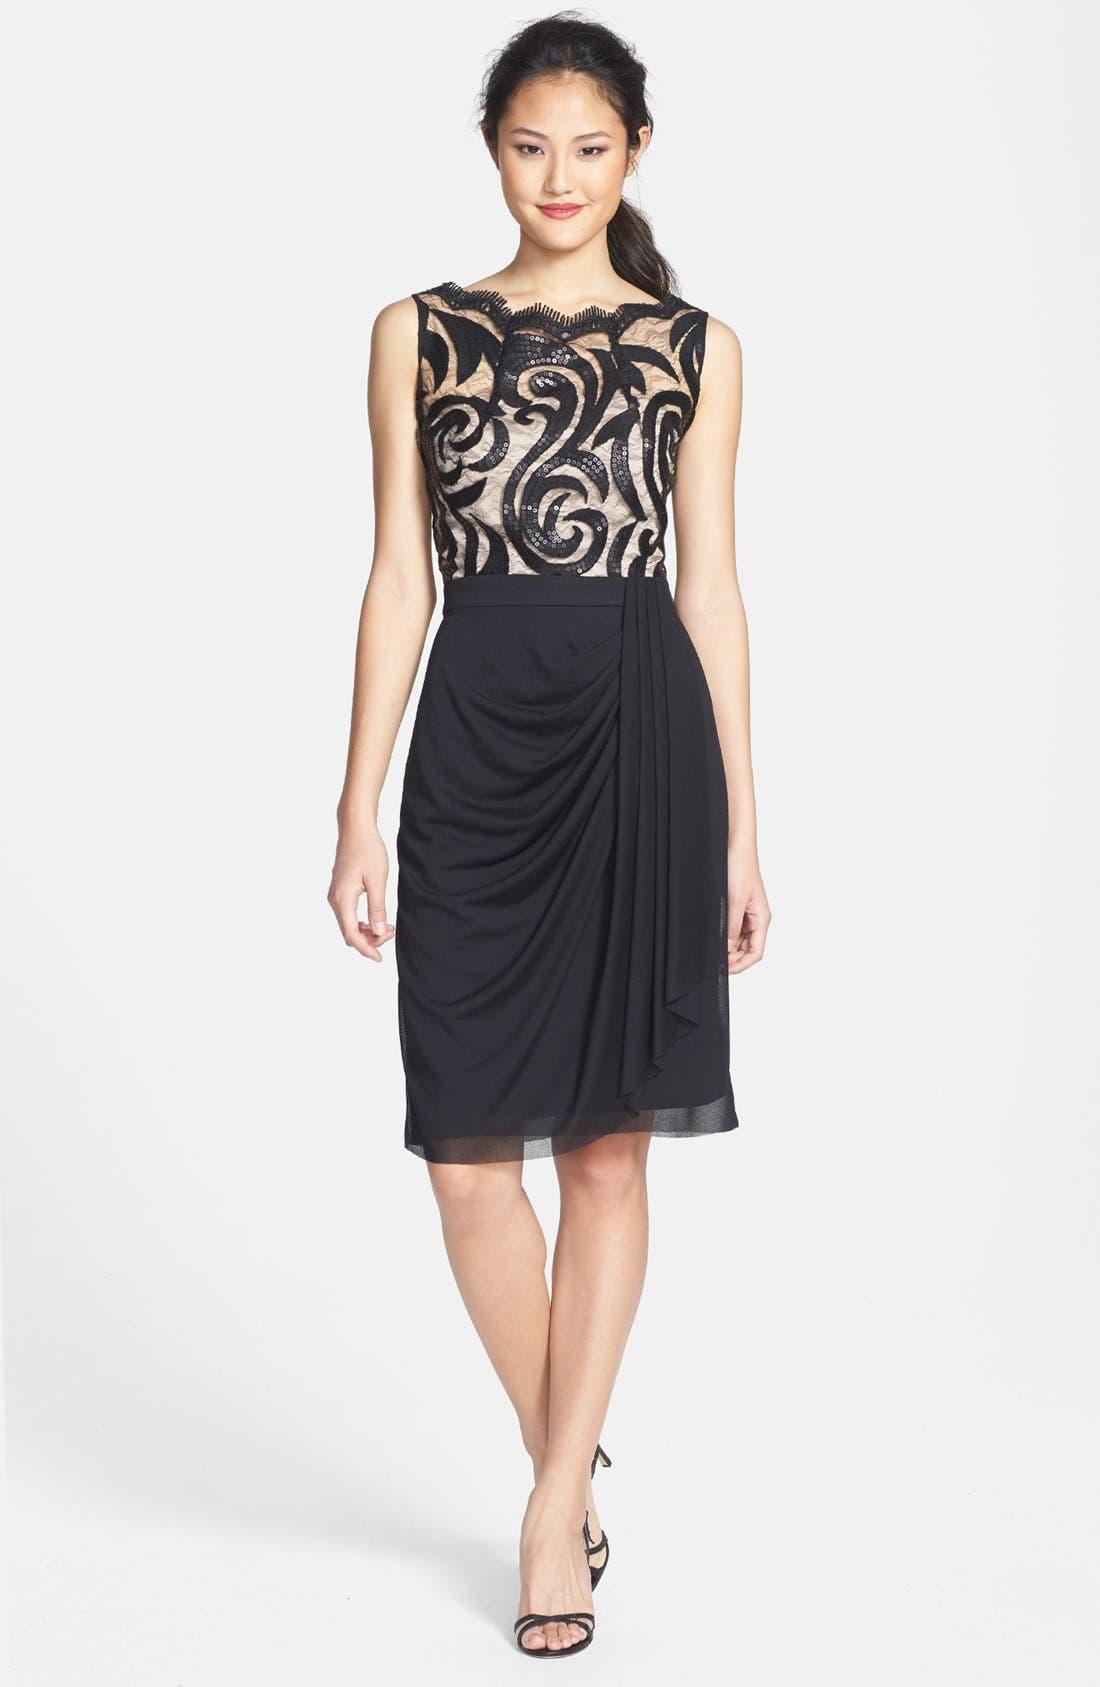 Alternate Image 1 Selected - Maggy London Embellished Draped Mesh Dress (Petite)